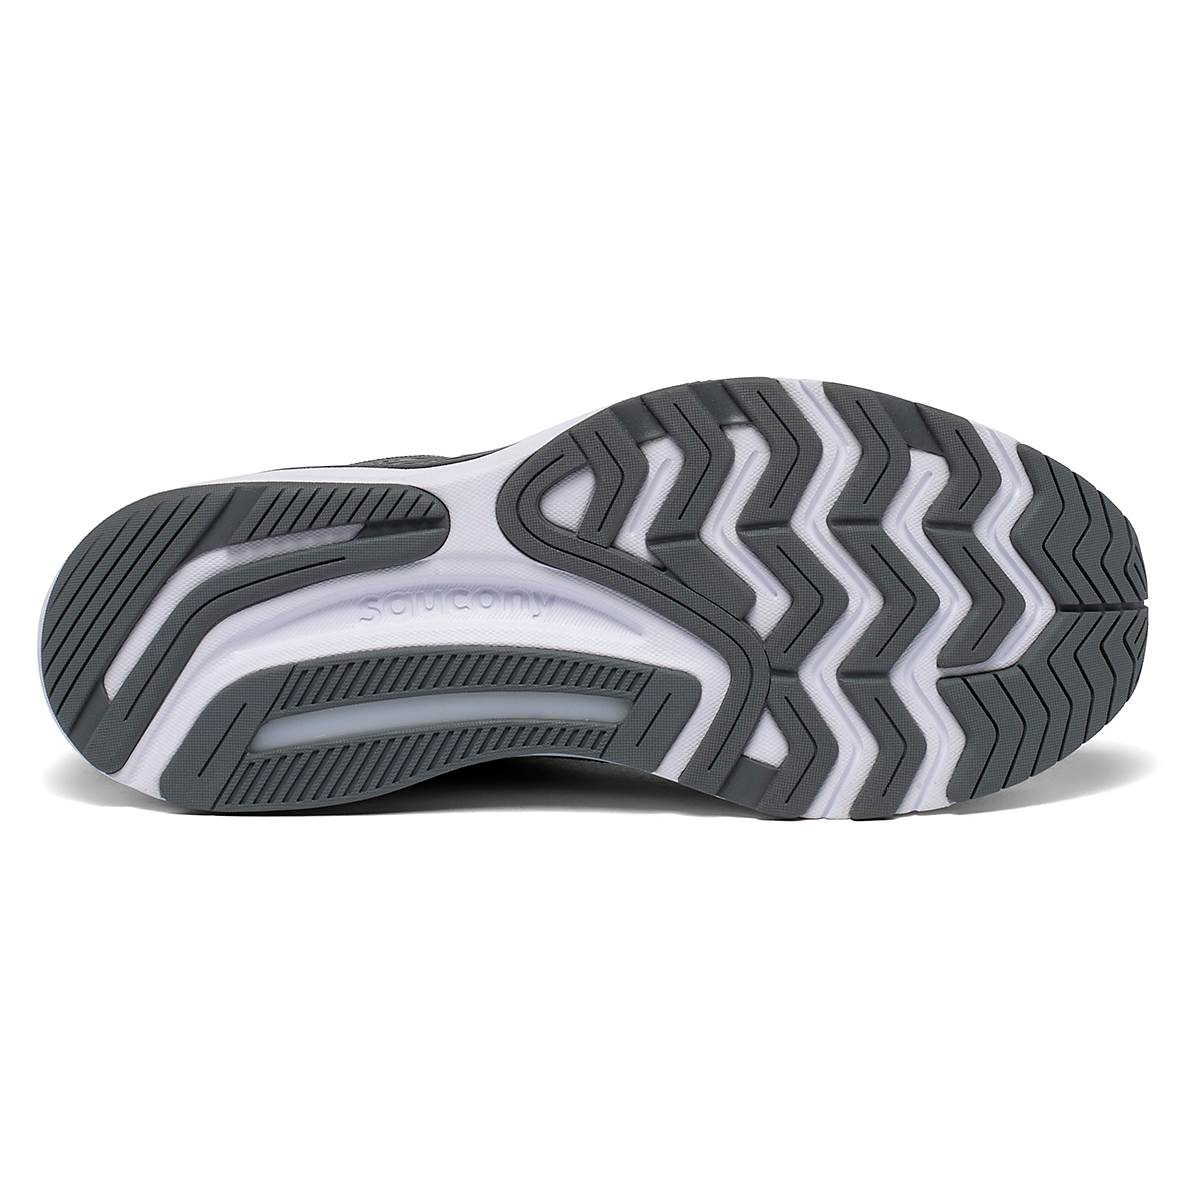 Men's Saucony Guide 14 Running Shoe - Color: Charcoal/Vizigold - Size: 7 - Width: Regular, Charcoal/Vizigold, large, image 5